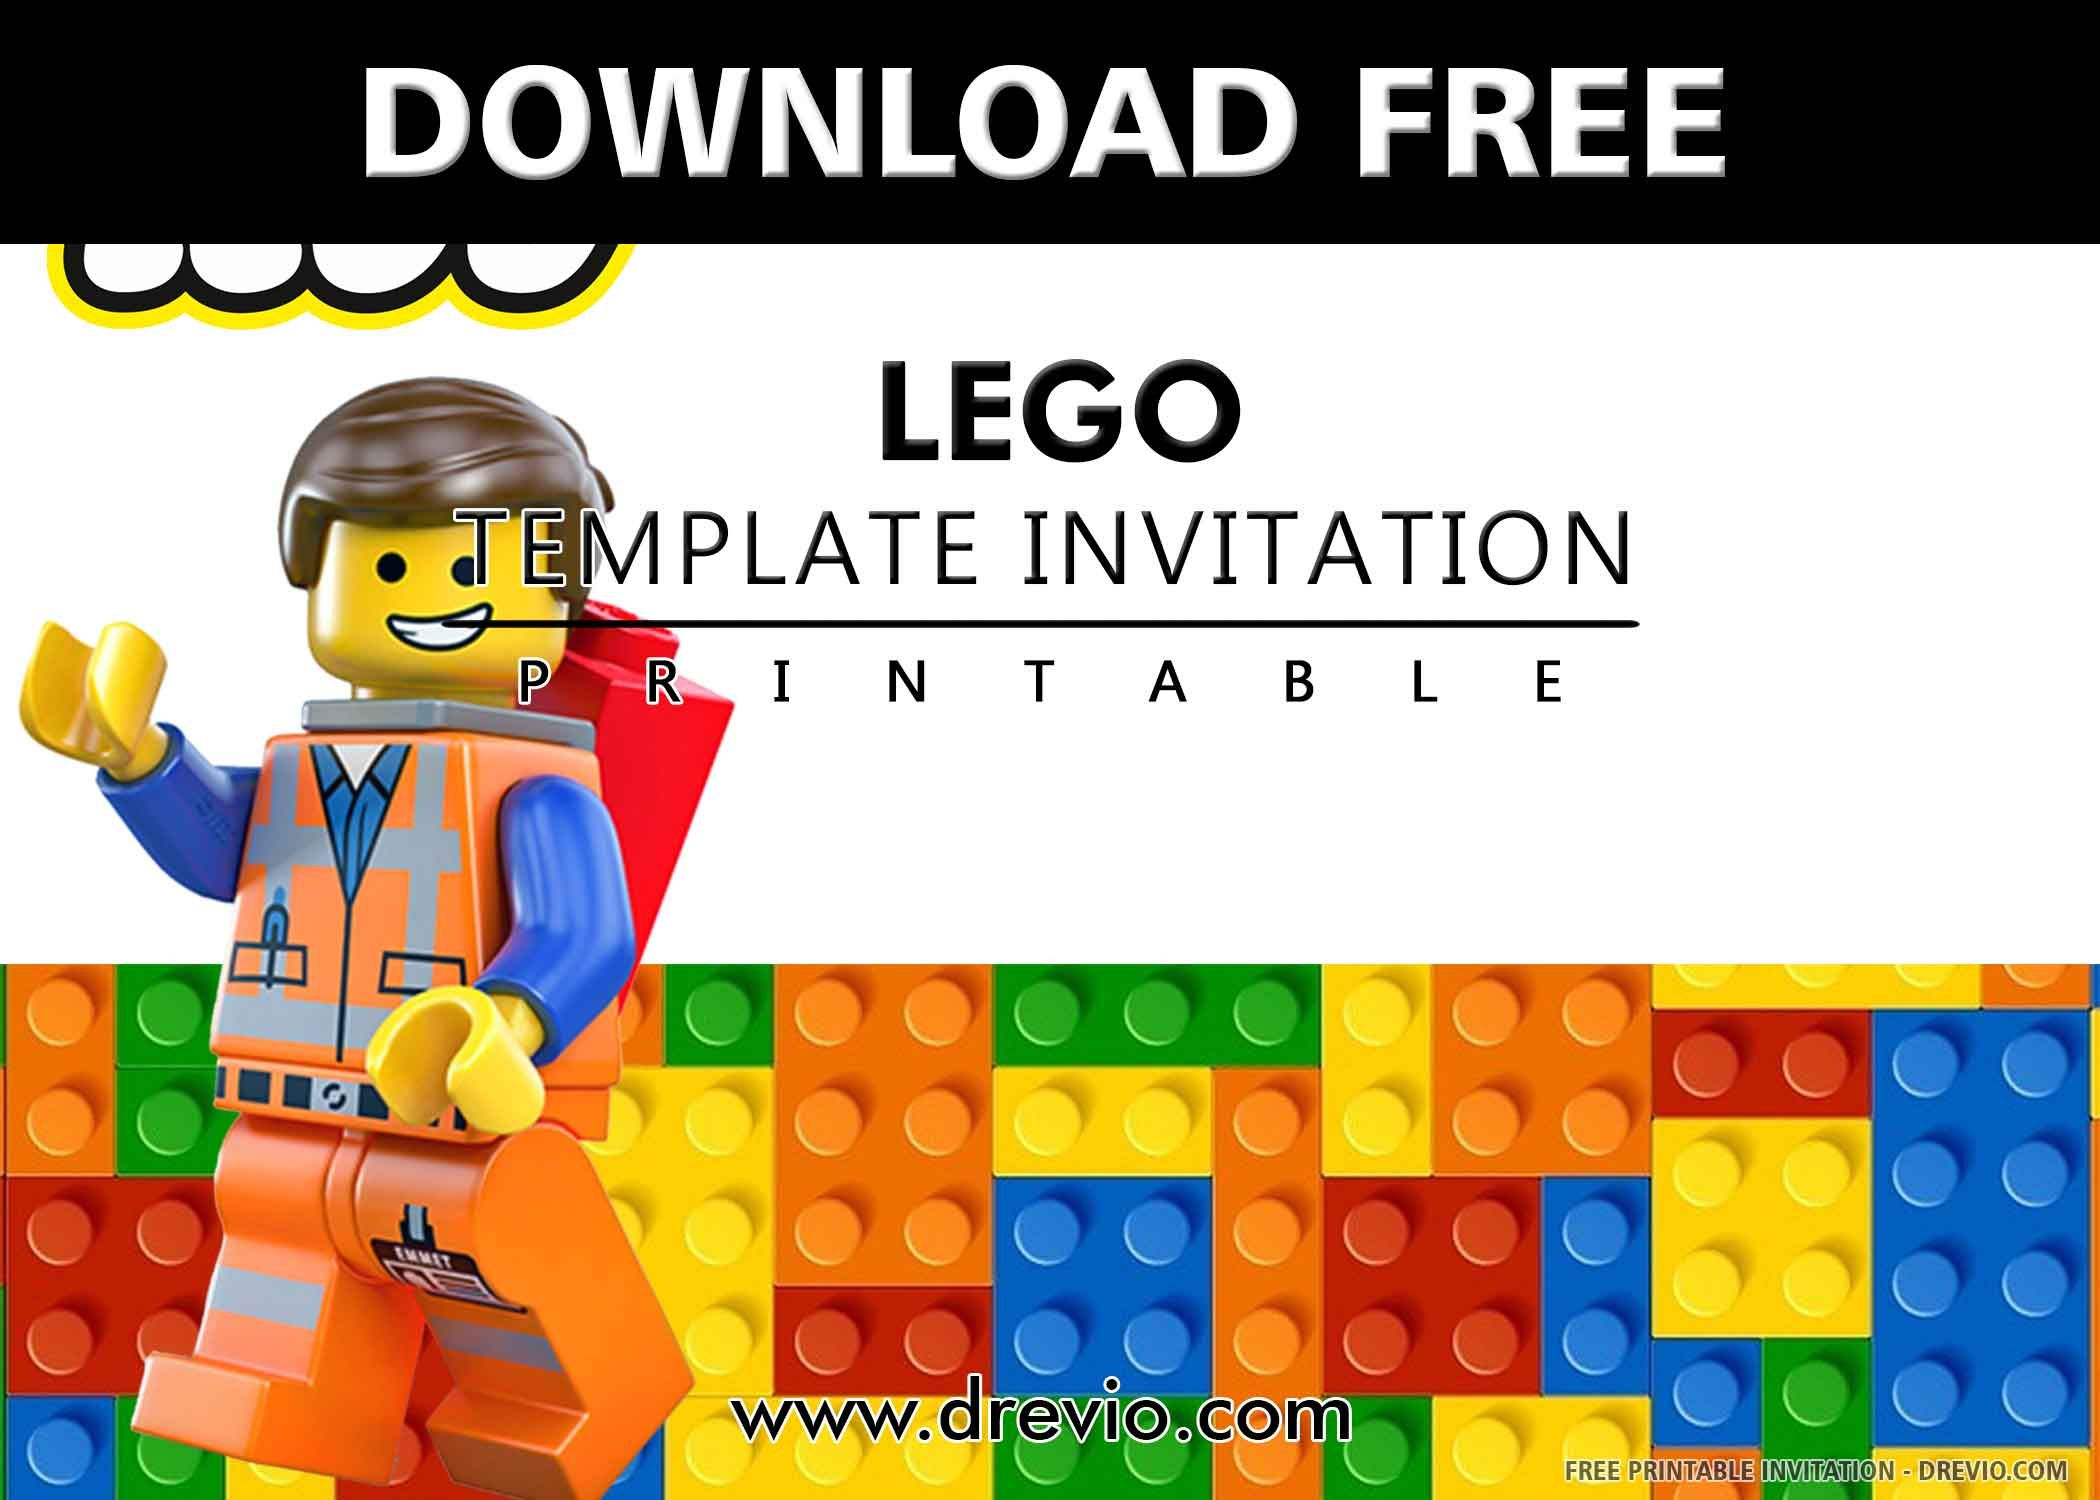 Free Printable Lego Birthday Invitation Templates